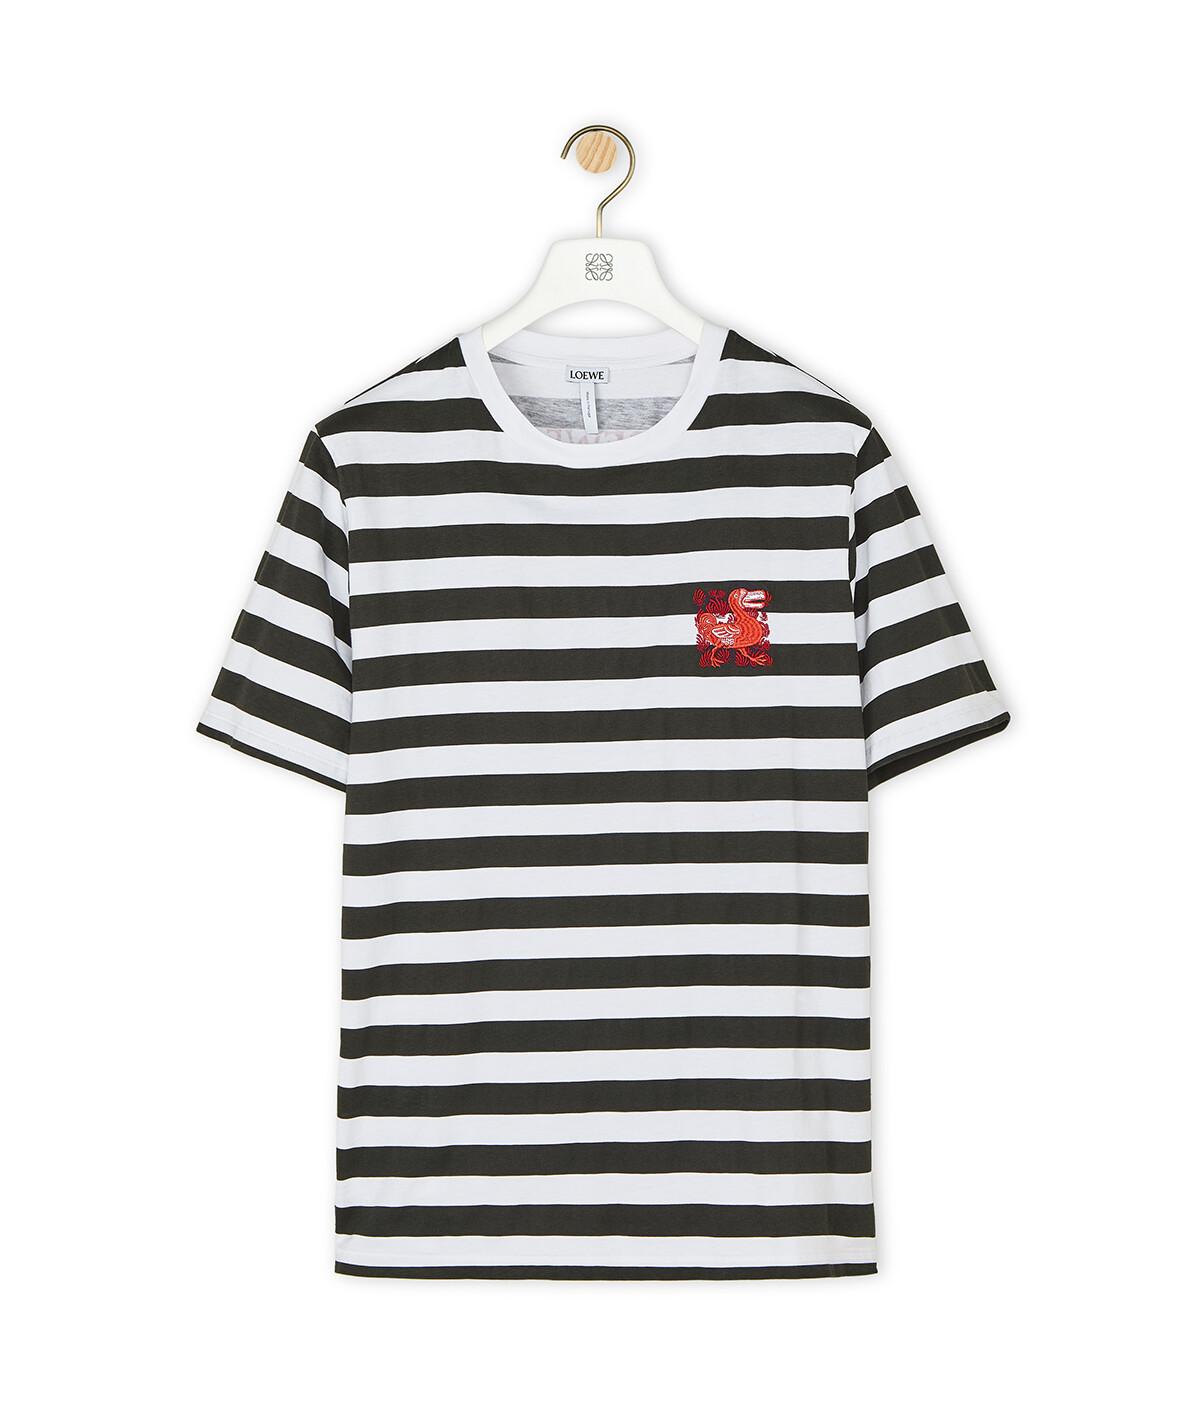 LOEWE Stripe T-Shirt Loewe Dodo Embroidered White/Black front